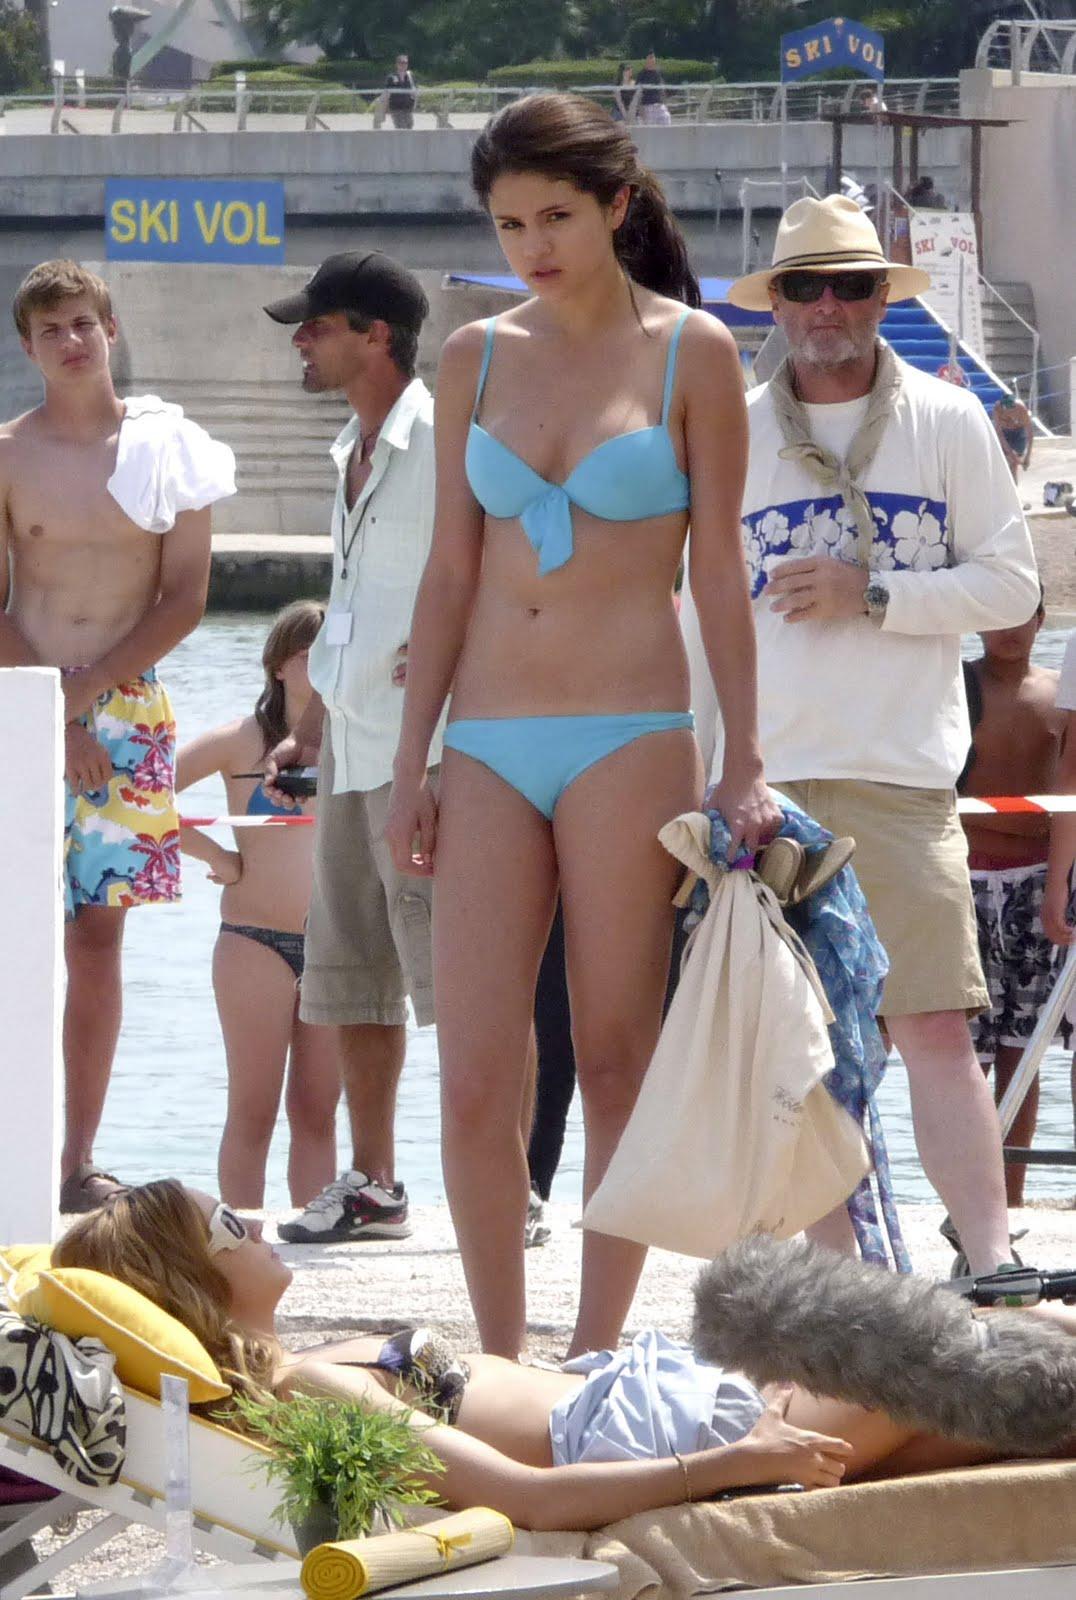 http://2.bp.blogspot.com/_w6co7oQVbqU/TDRdXTlmU8I/AAAAAAAAC-A/dKypq14FiW4/s1600/05227_selena_gomez_bikini_monte_carlo_19_122_14lo.jpg